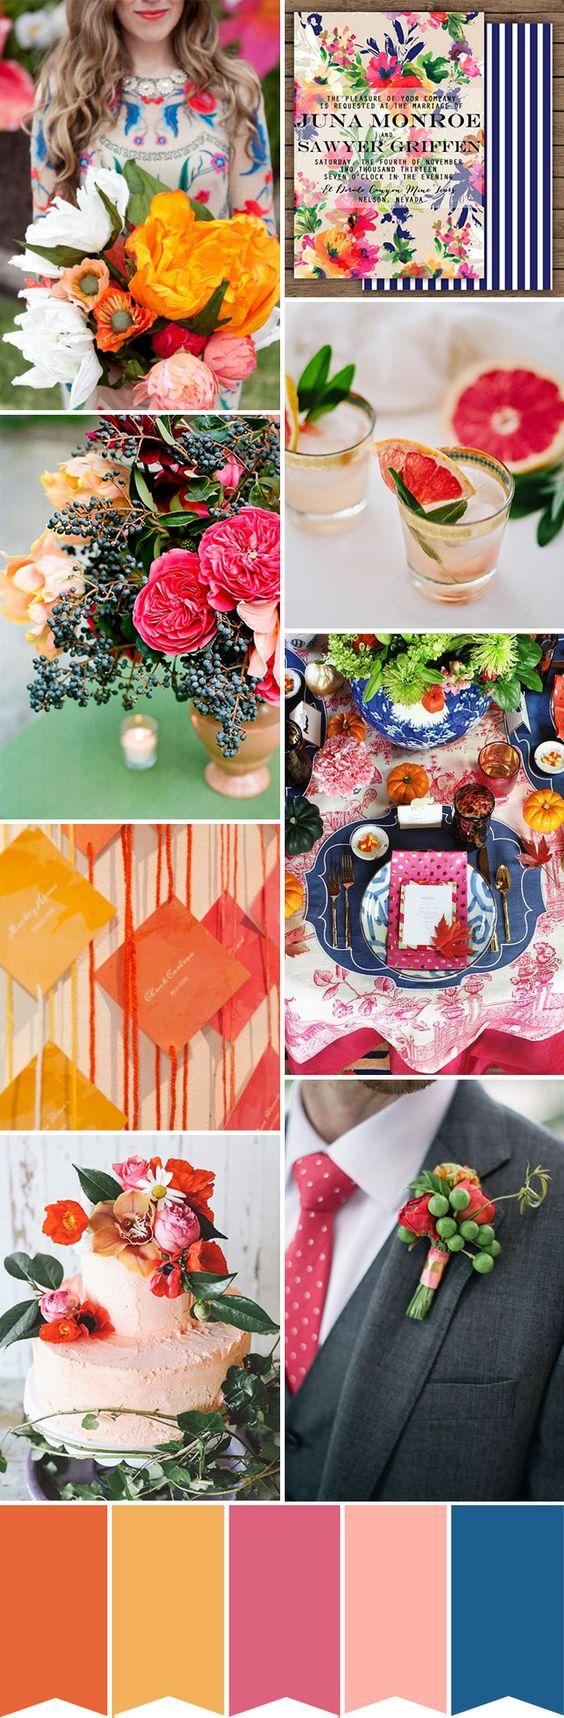 Color pop! Eclectic Orange Pink and Blue Wedding Colour Palette   Colores Pop; naranja, rosa y azul   #wedding #boda #paletacolores